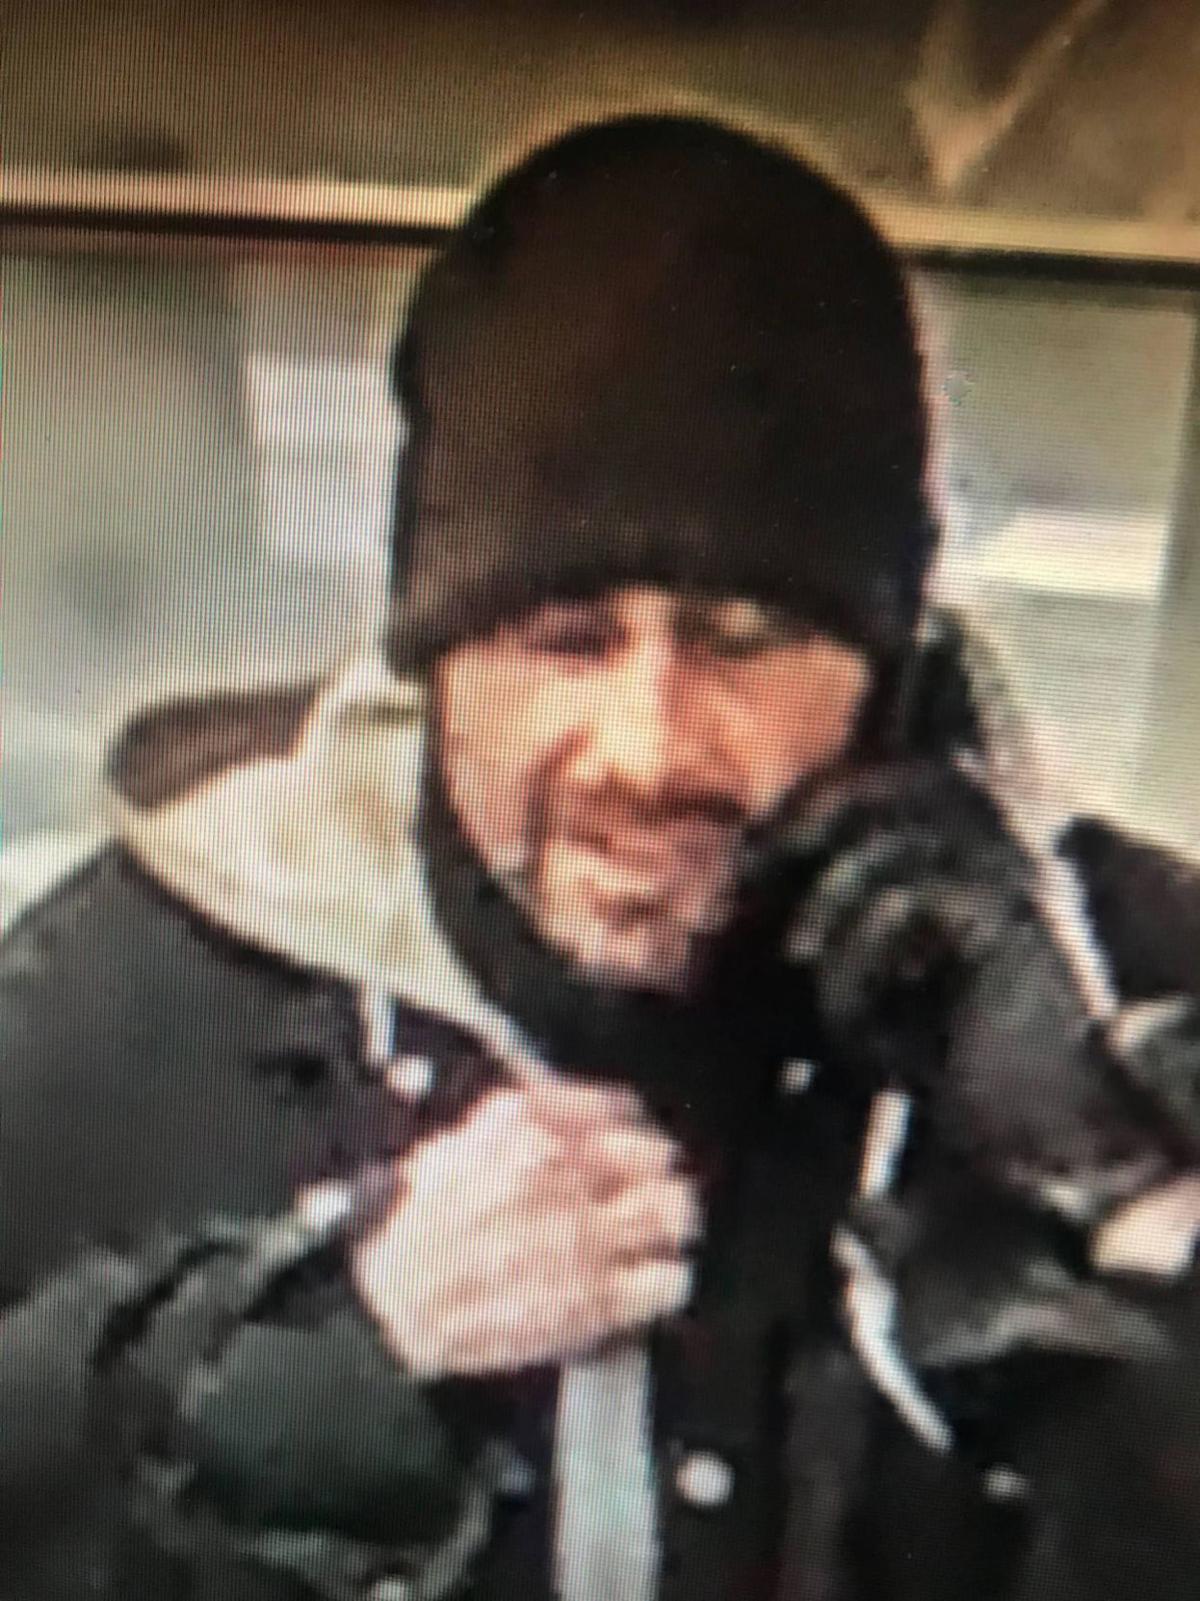 TD Bank robber suspect